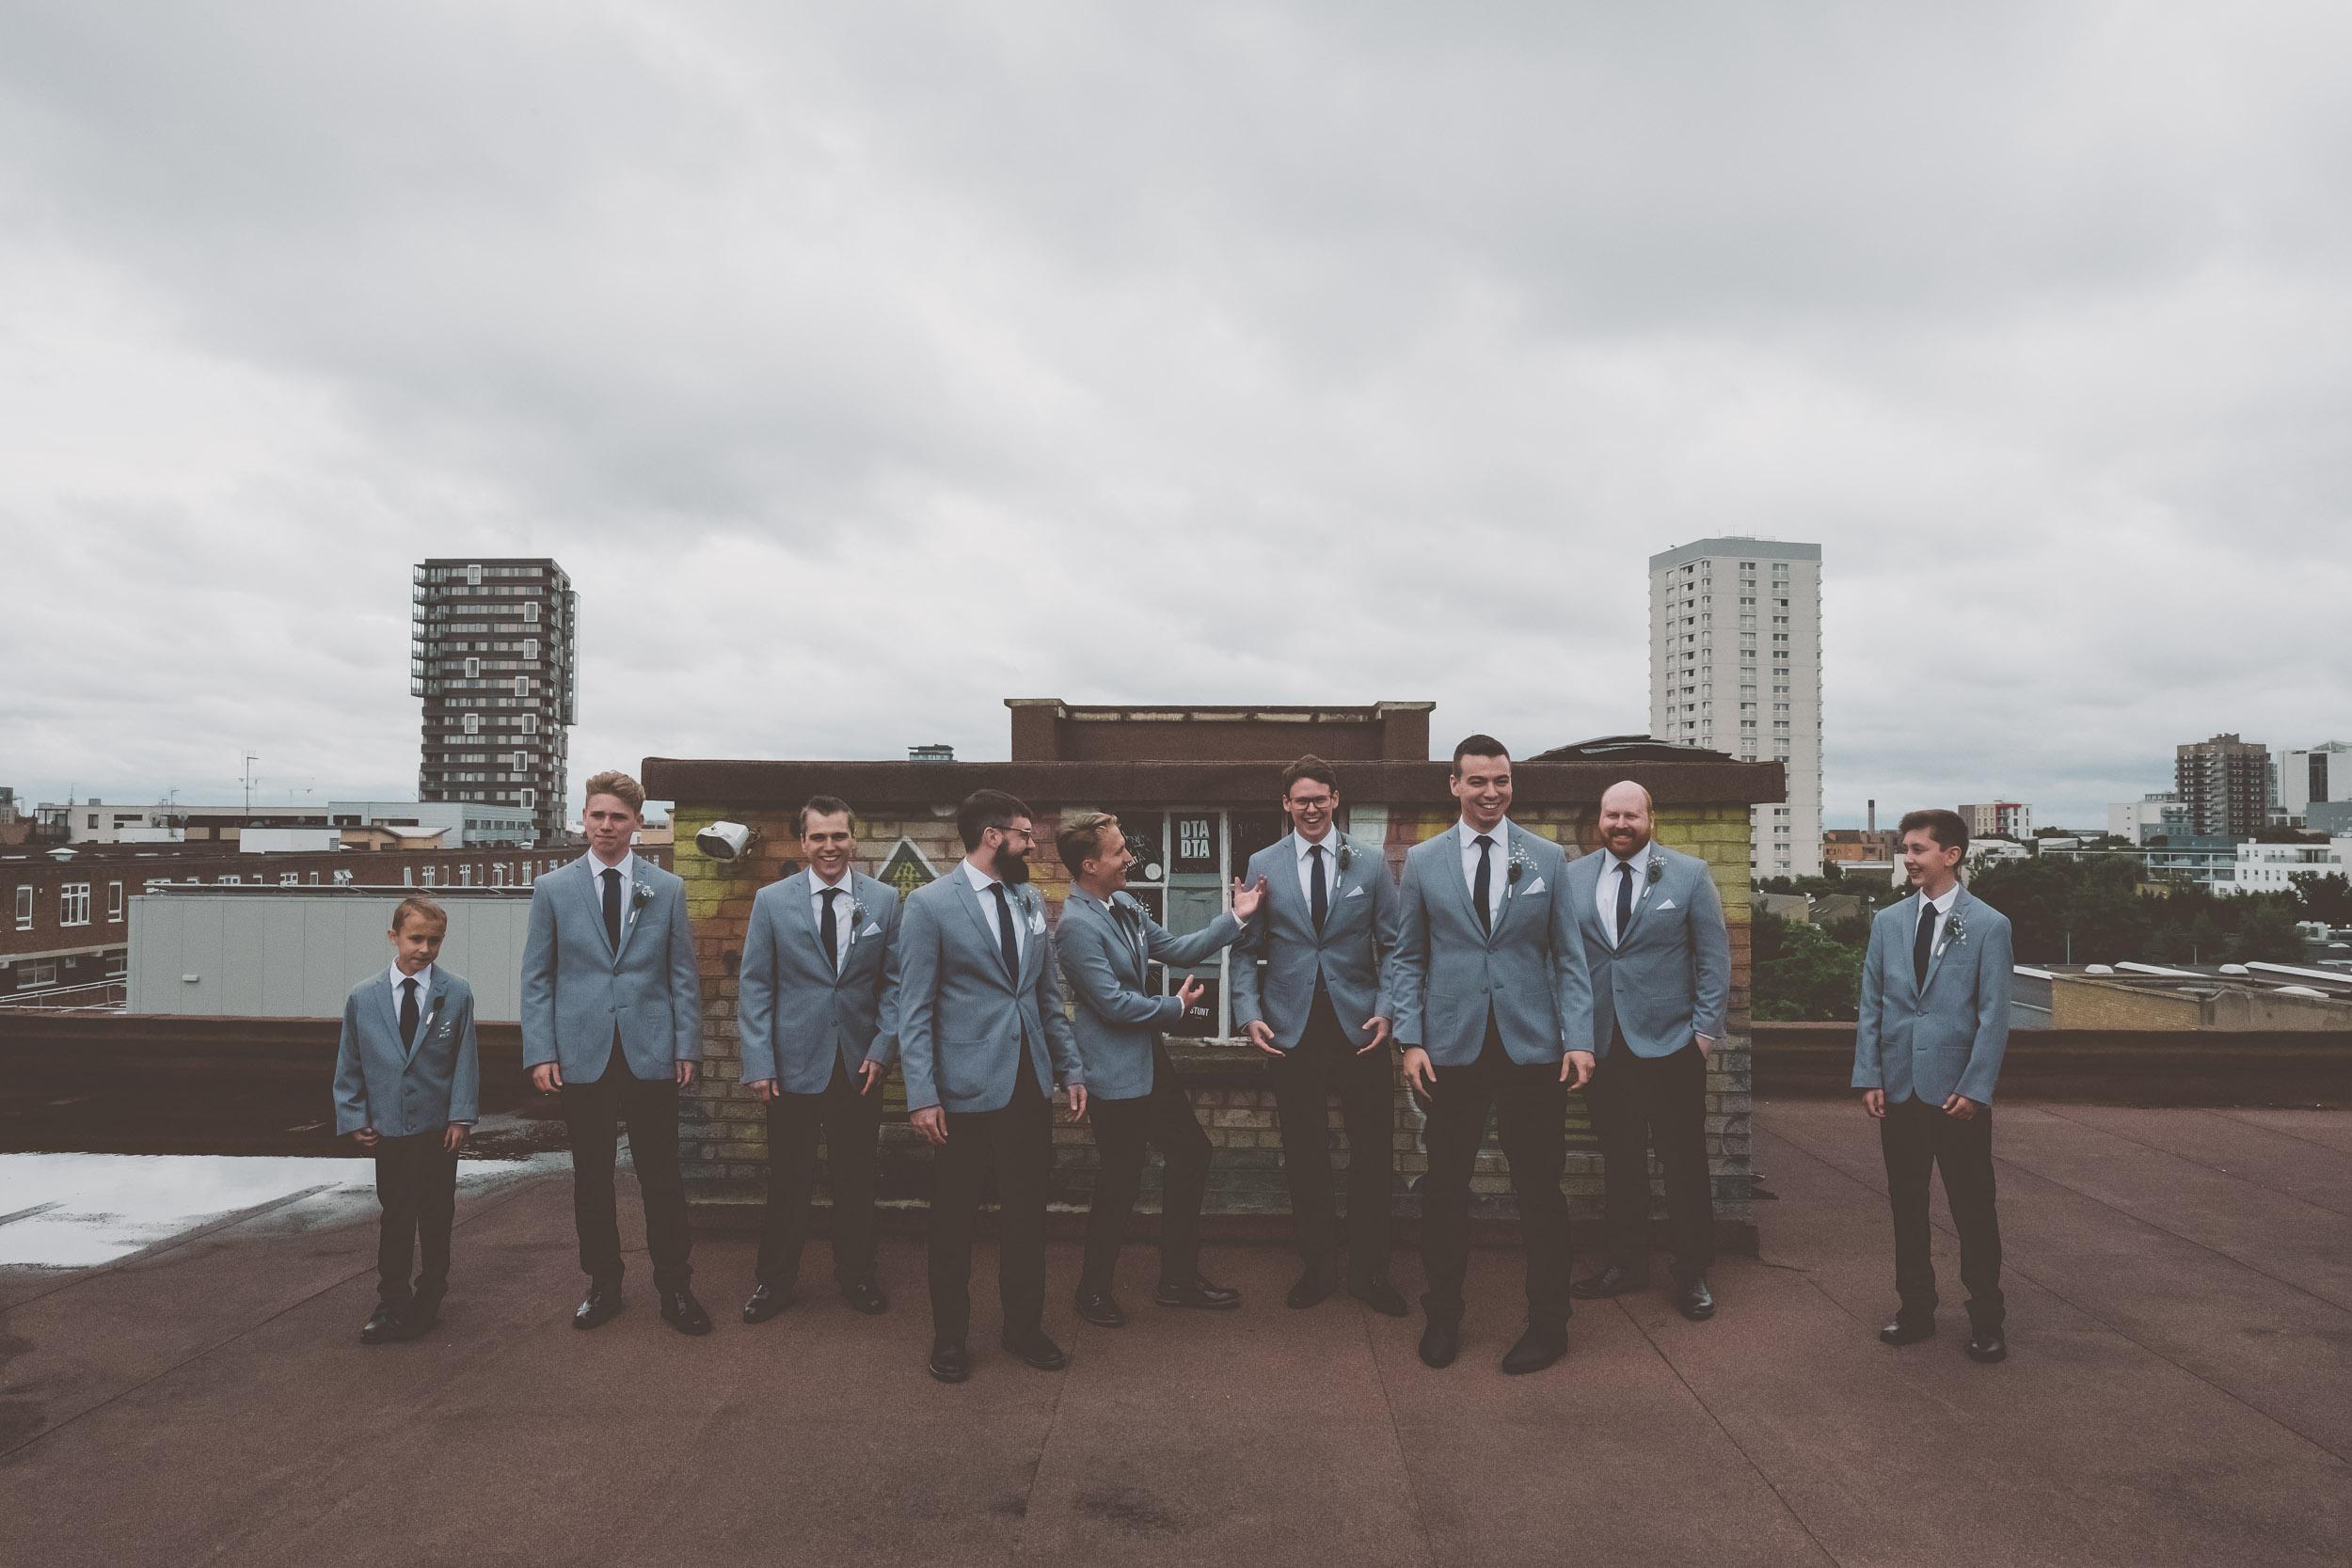 islington-town-hall-4th-floor-studios-wedding258.jpg